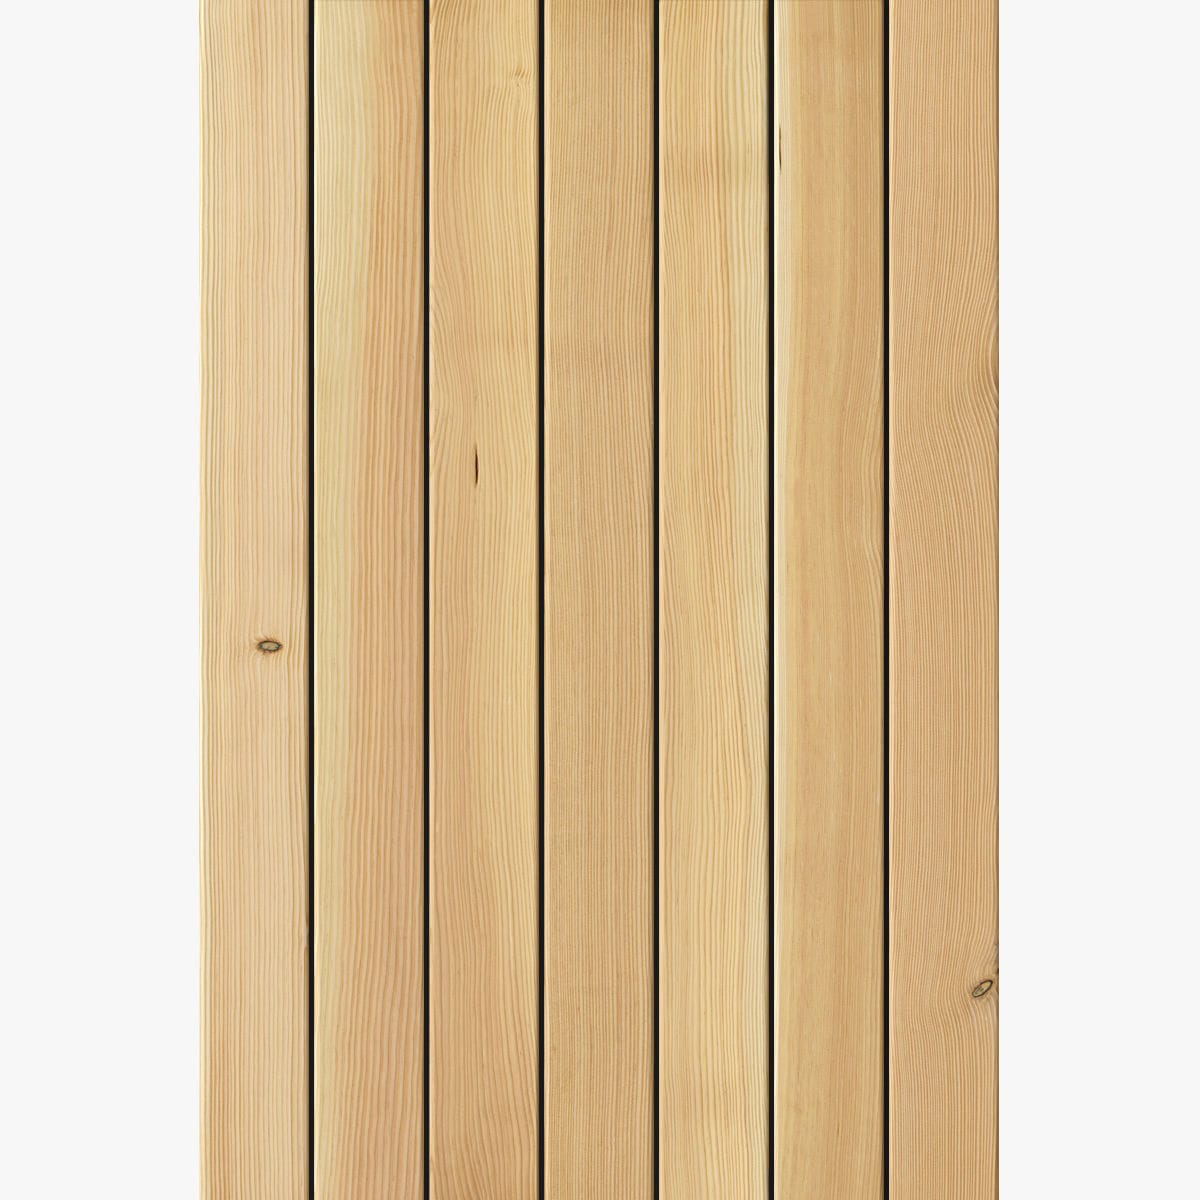 Pur Natur solid wood deck boards douglas fir glued durable kollin